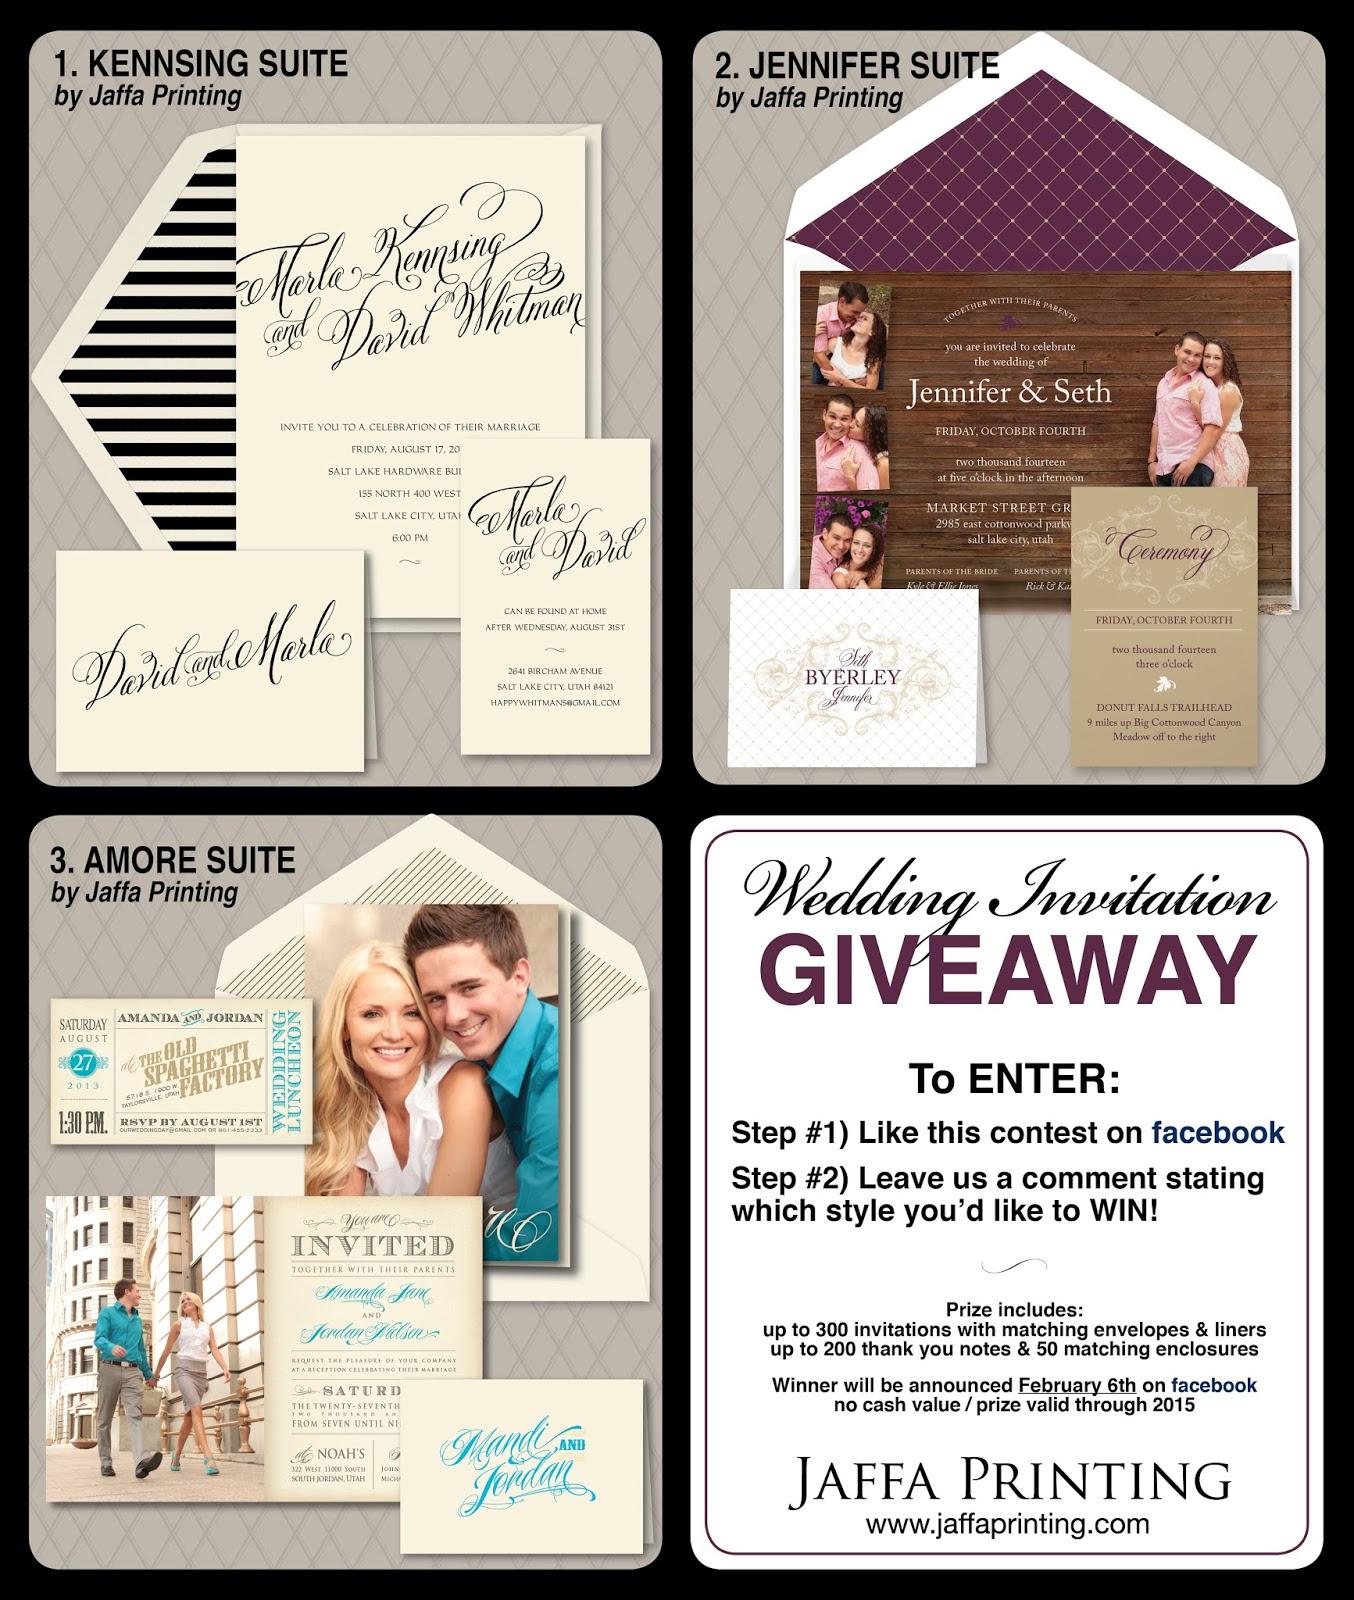 Wedding Invitation Blog: Wedding Invitation Giveaway